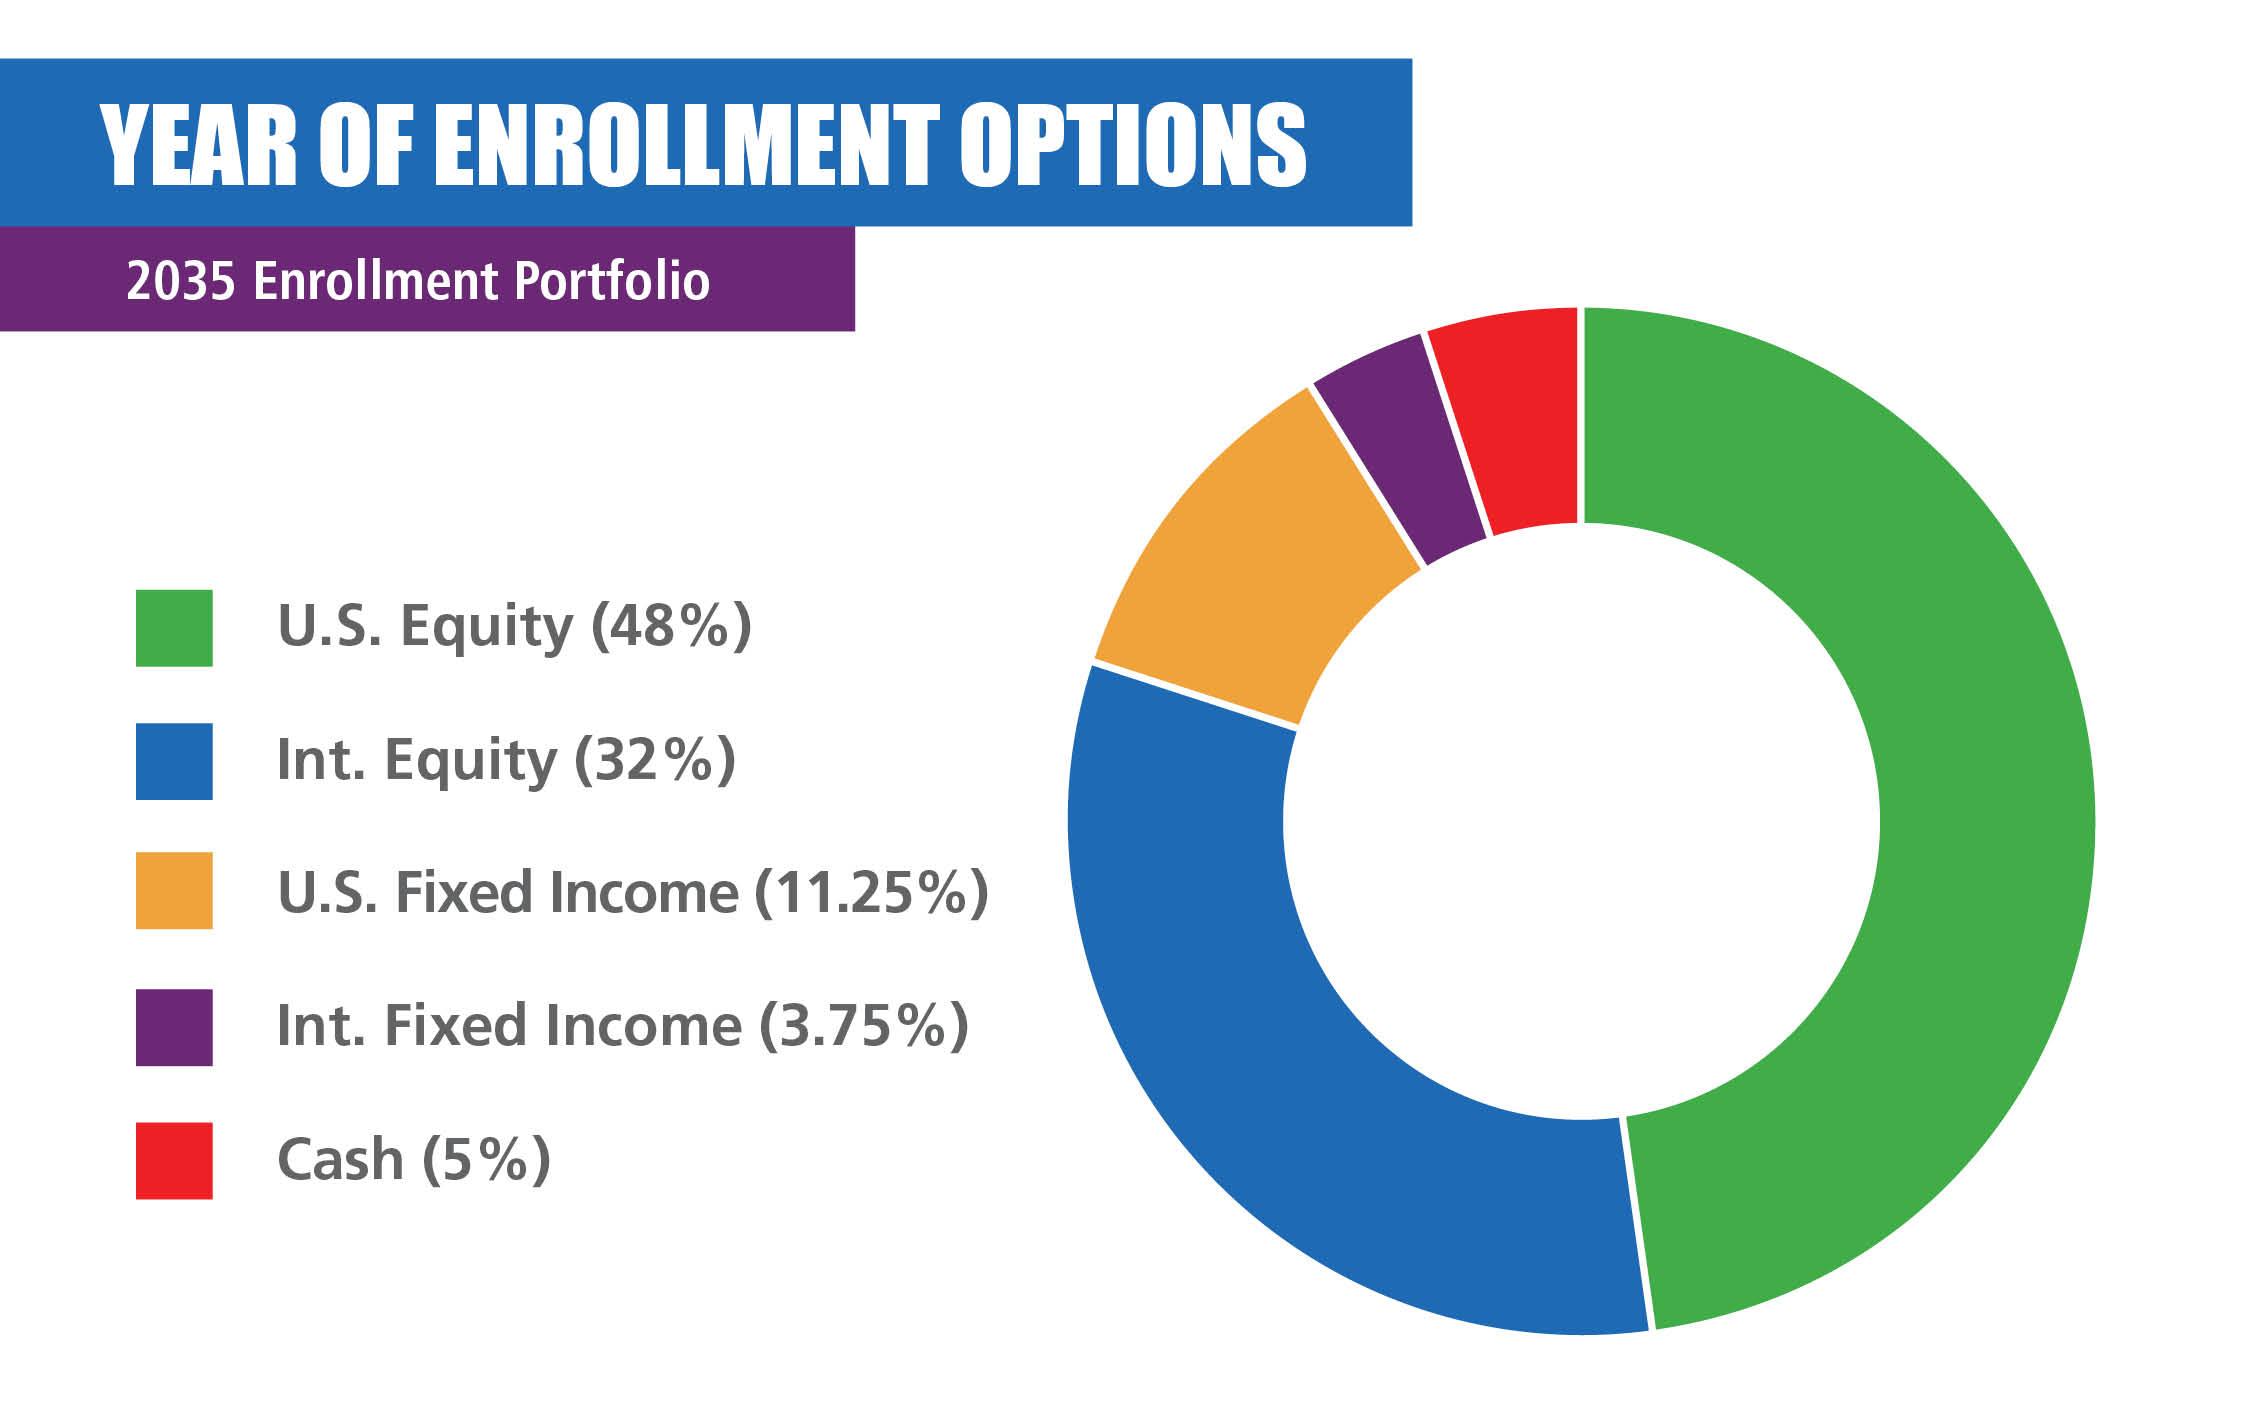 2035 Enrollment Portfolio